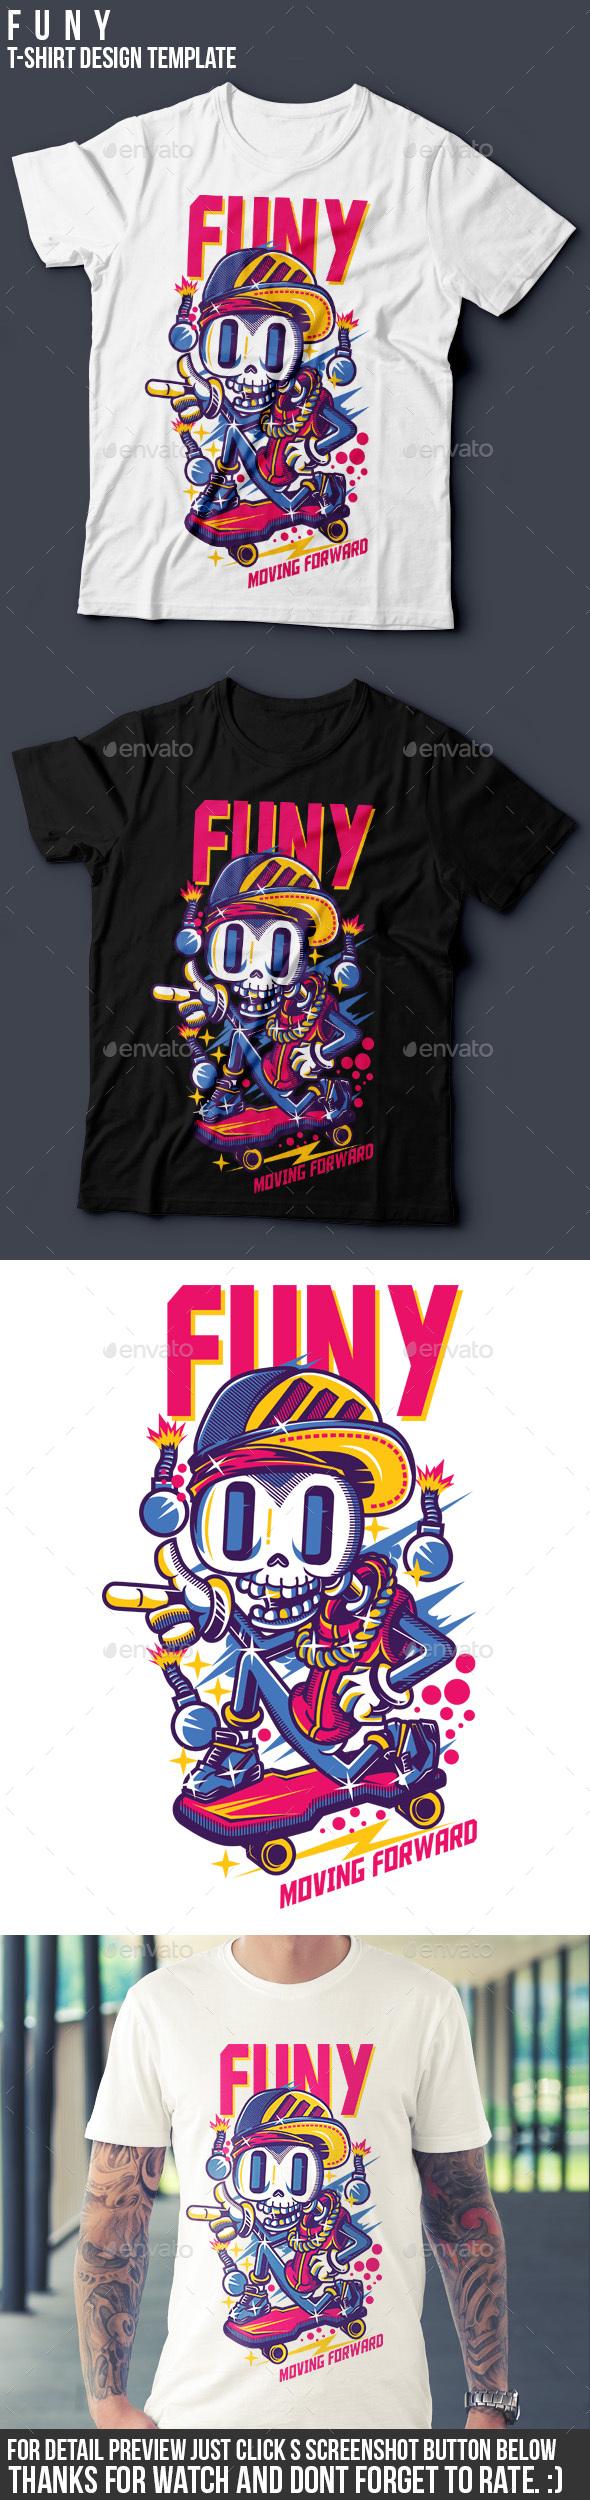 Funy T-Shirt Design